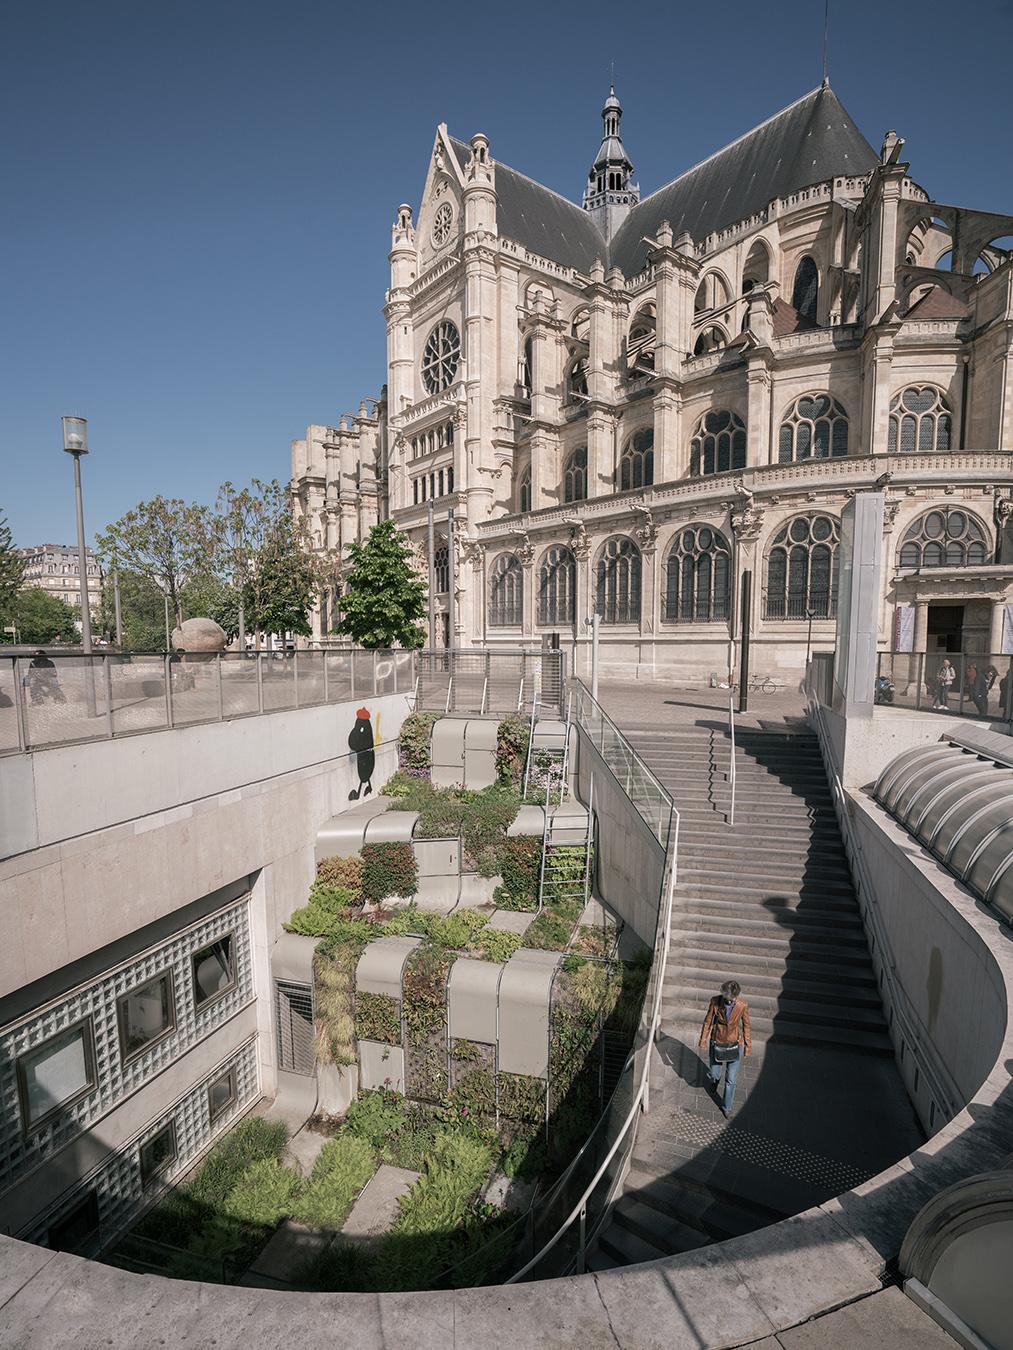 dvsn-collective-journal-paris-france-travel-2-2